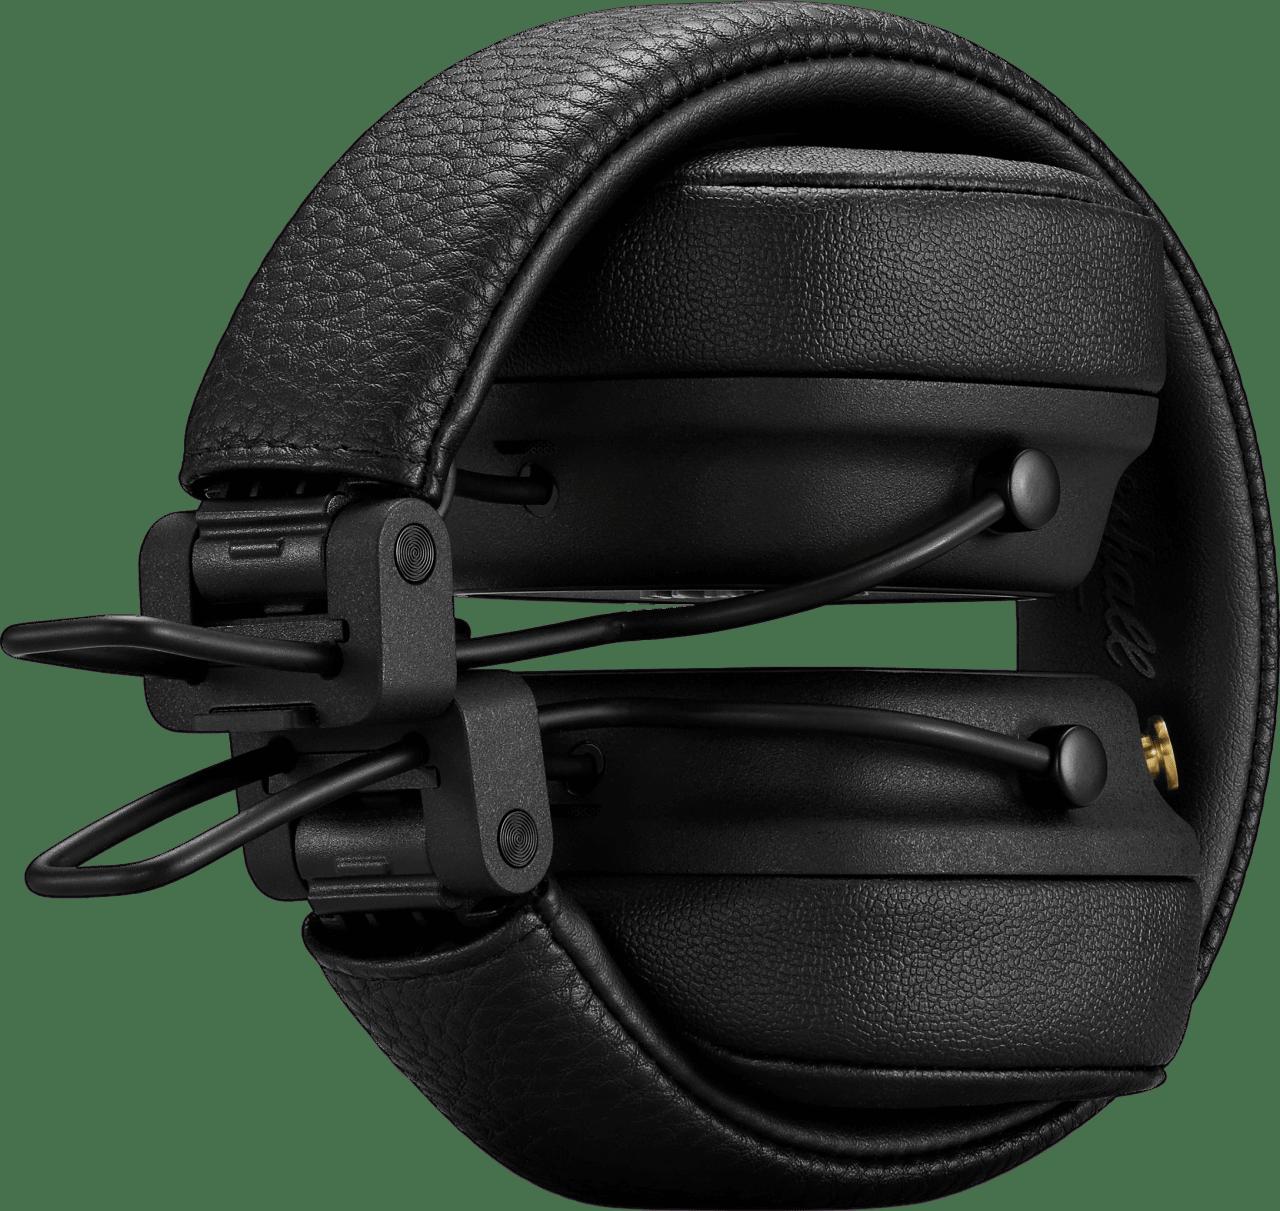 Schwarz Marshall Major IV On-ear Bluetooth Headphones.3